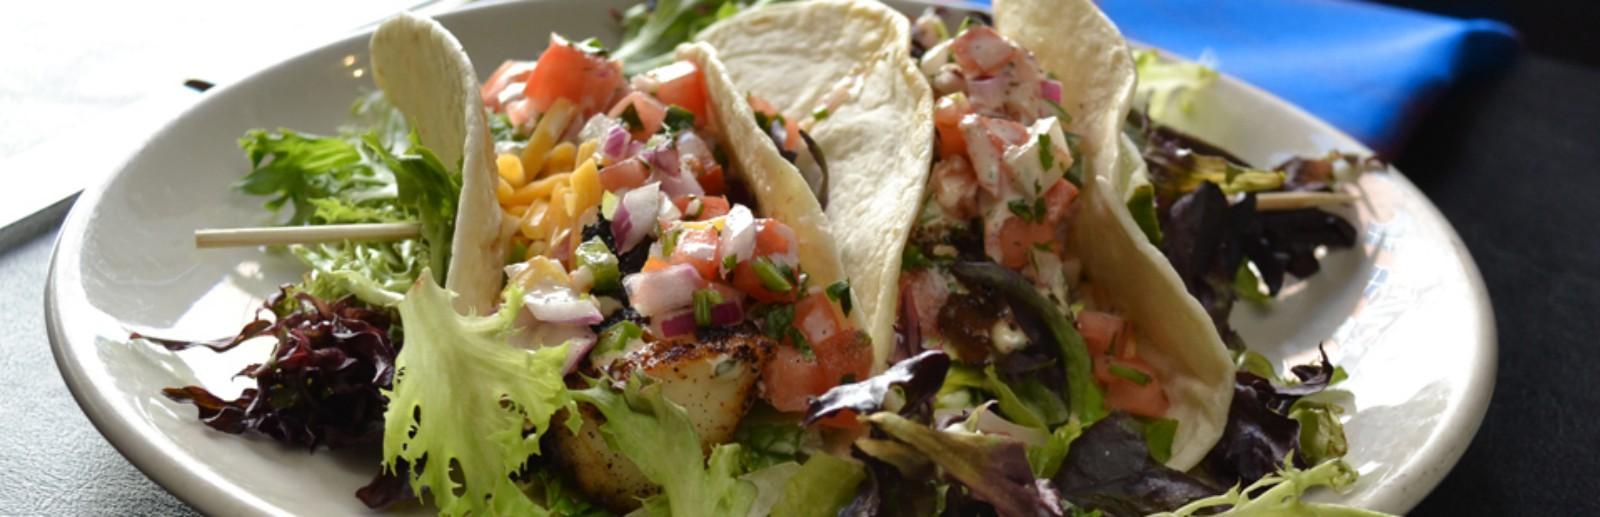 blackened_fish_tacos